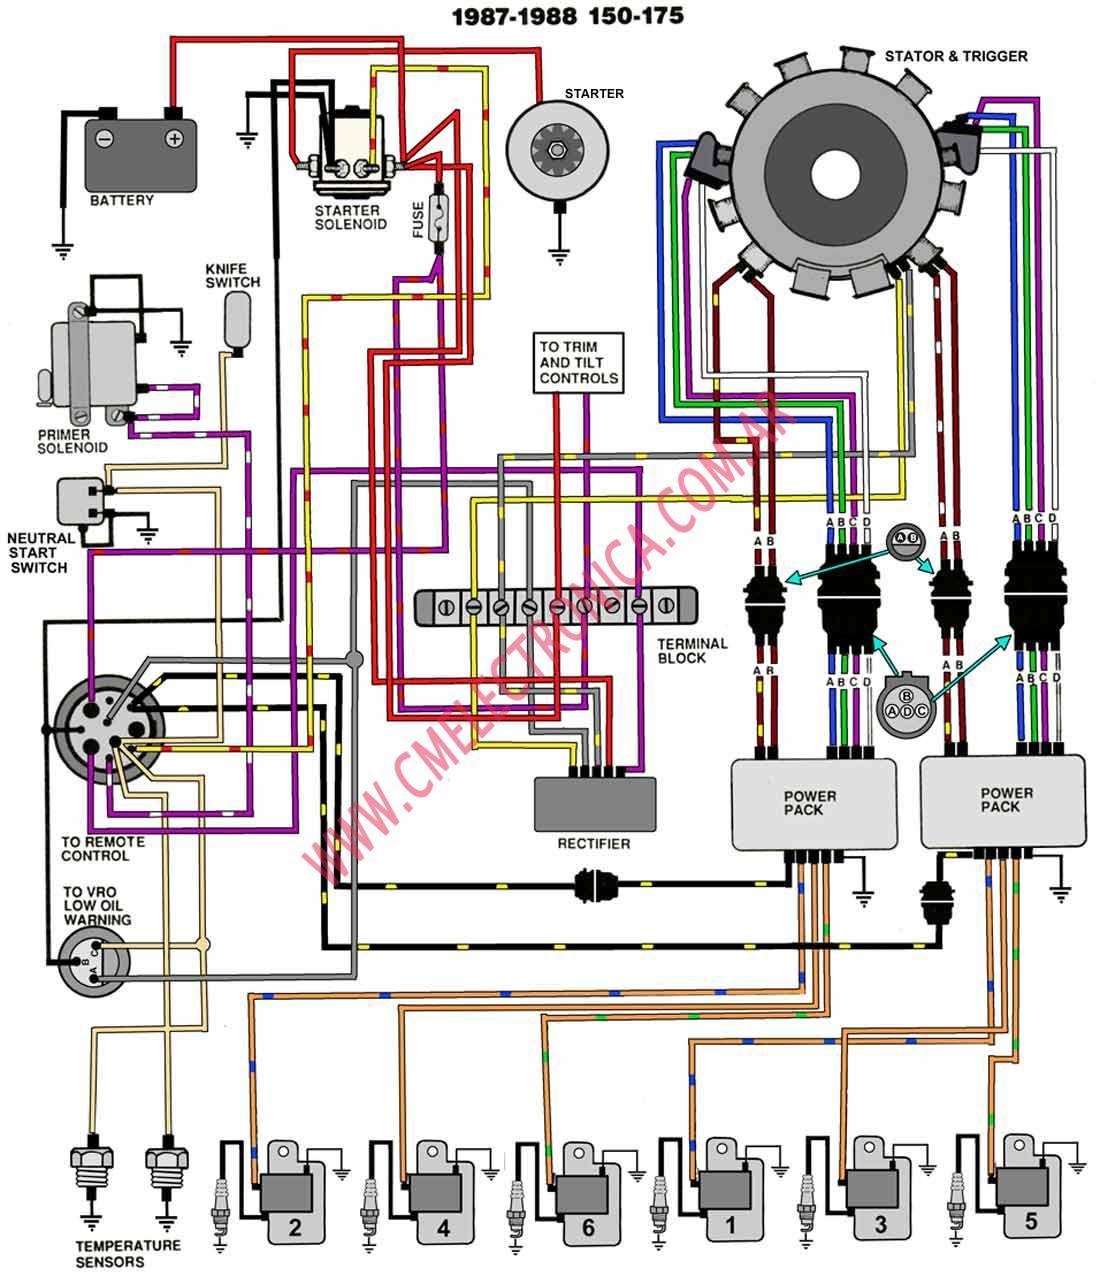 Diagrama Evinrude Johnson 87 88 150 175 - Johnson Outboard Starter Solenoid Wiring Diagram